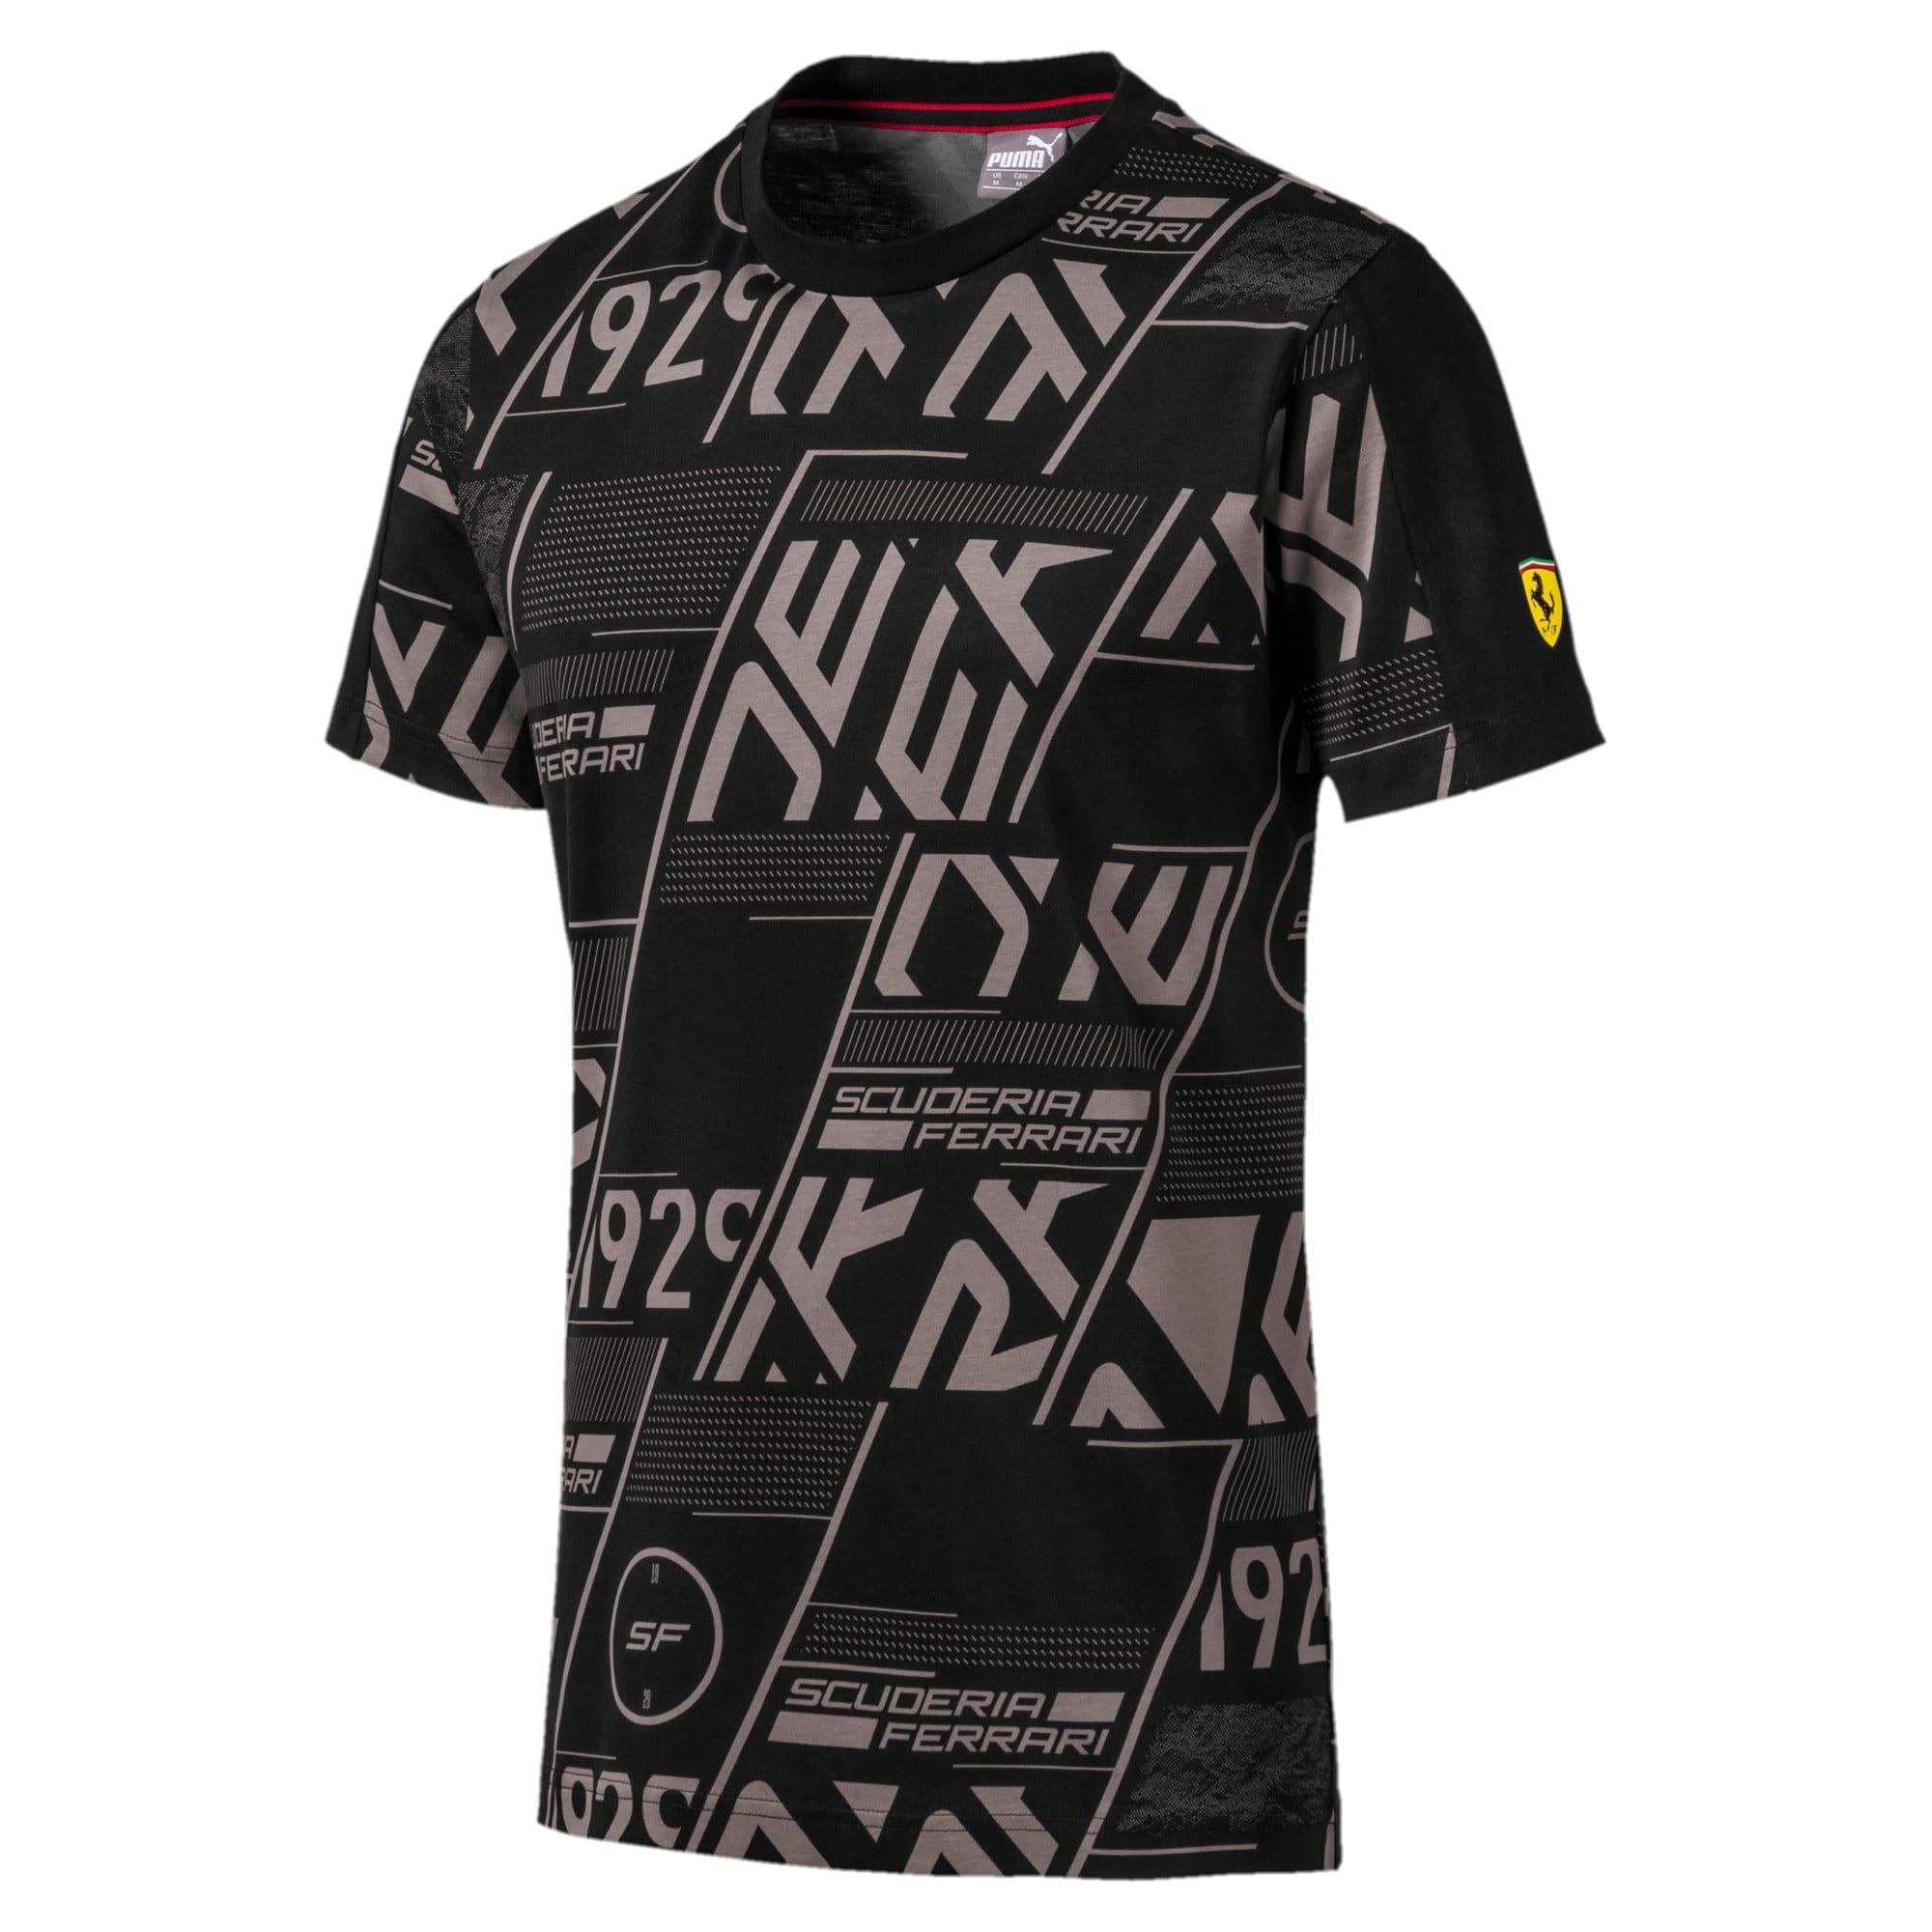 Miniatura 1 de Camiseta Scuderia Ferrari AOP para hombre, Puma Black, mediano